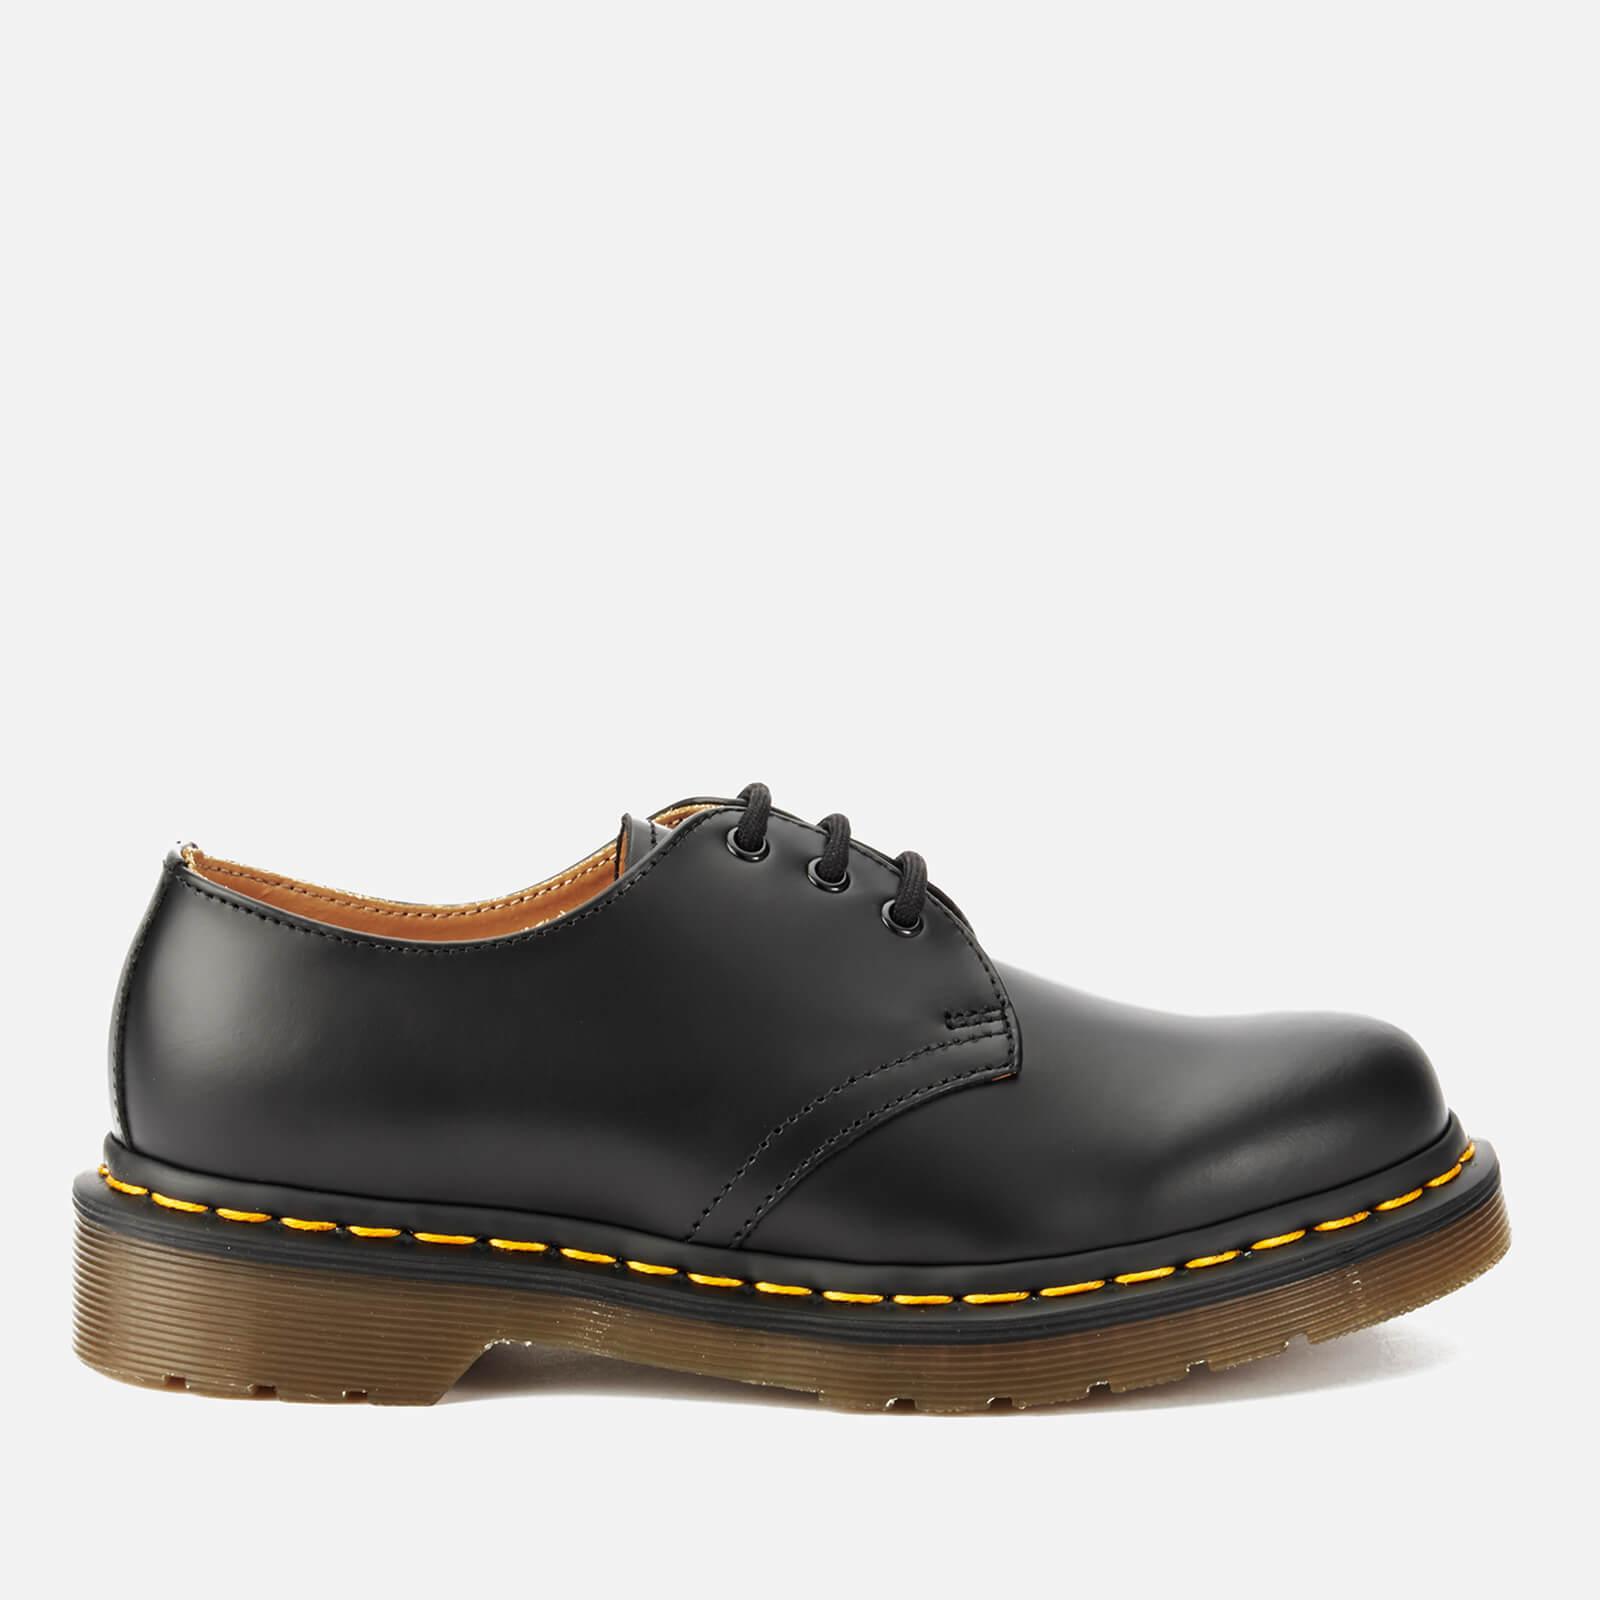 Dr. Martens 1461 Smooth Leather 3-Eye Shoes - Black - UK 8